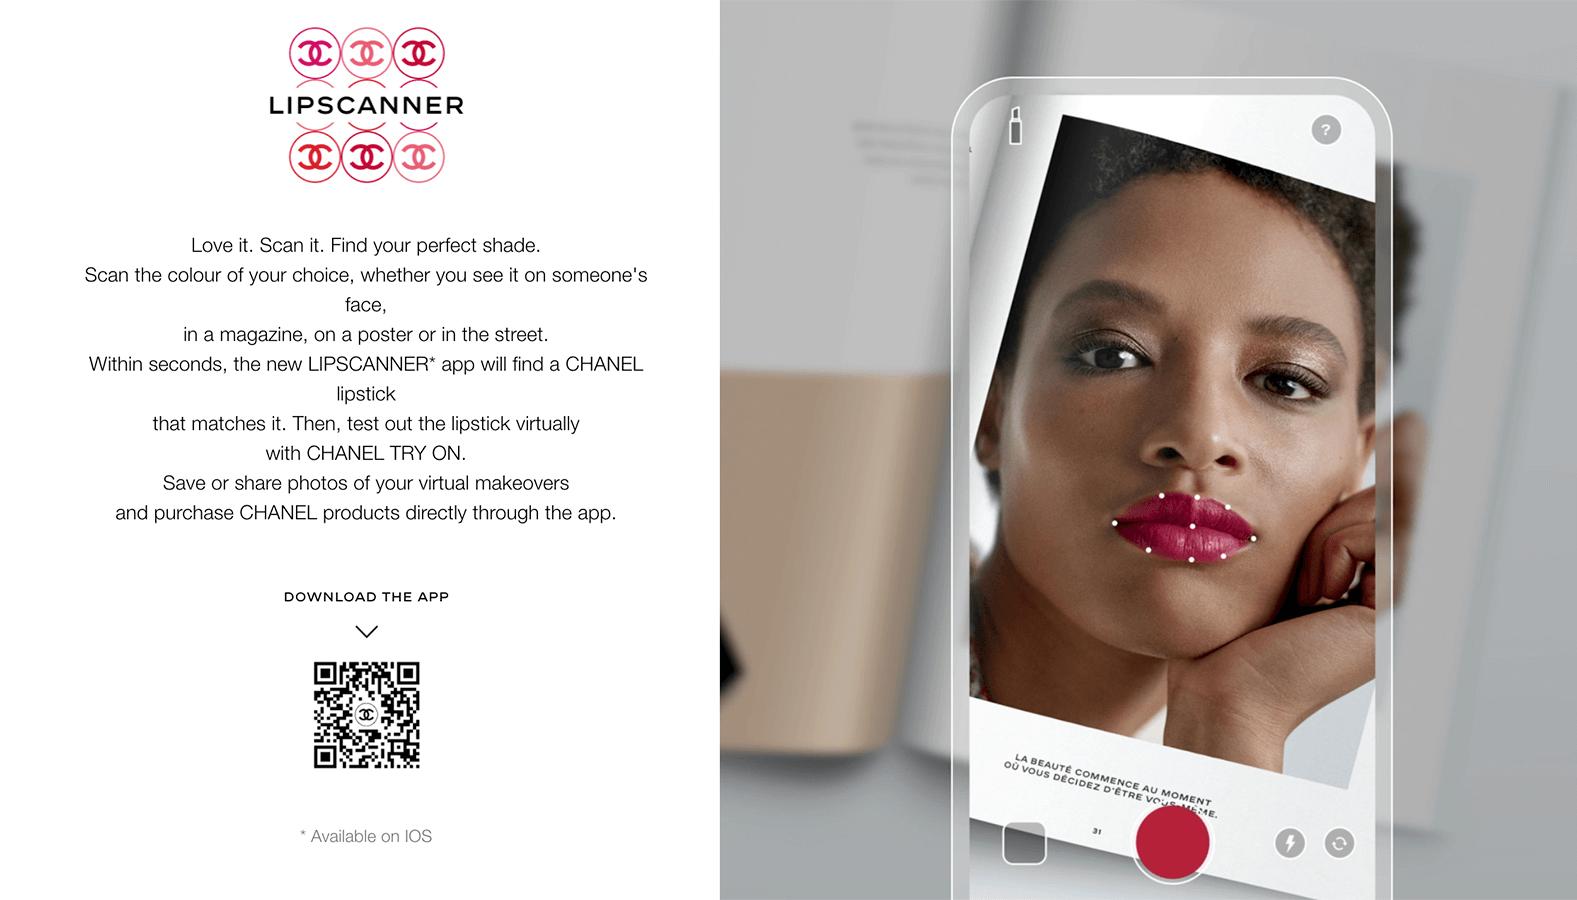 Chanel's lipstickscanner